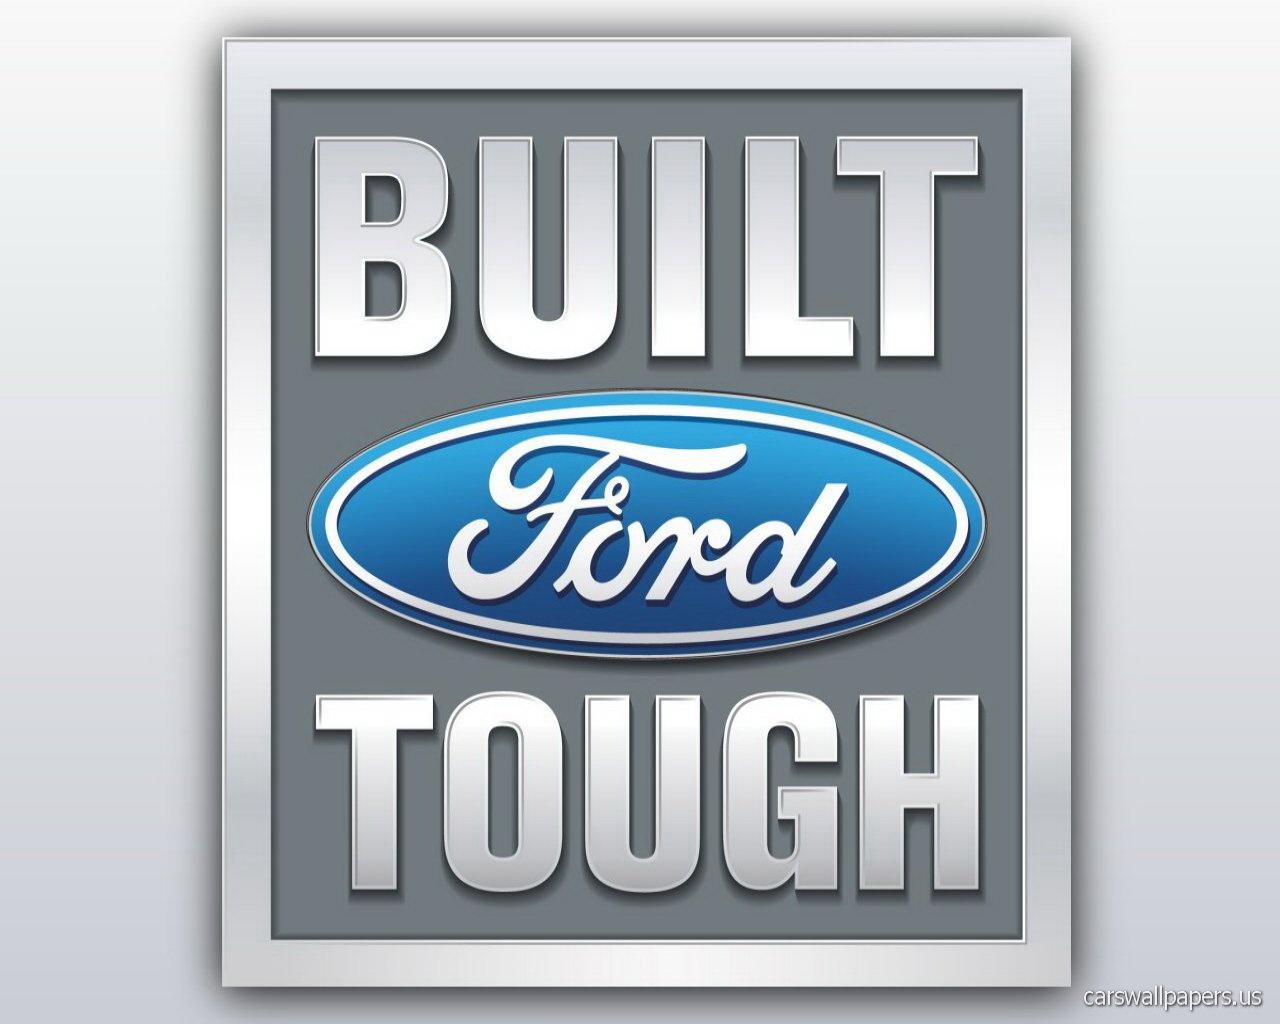 ford built tough logo wallpapers 1280x1024